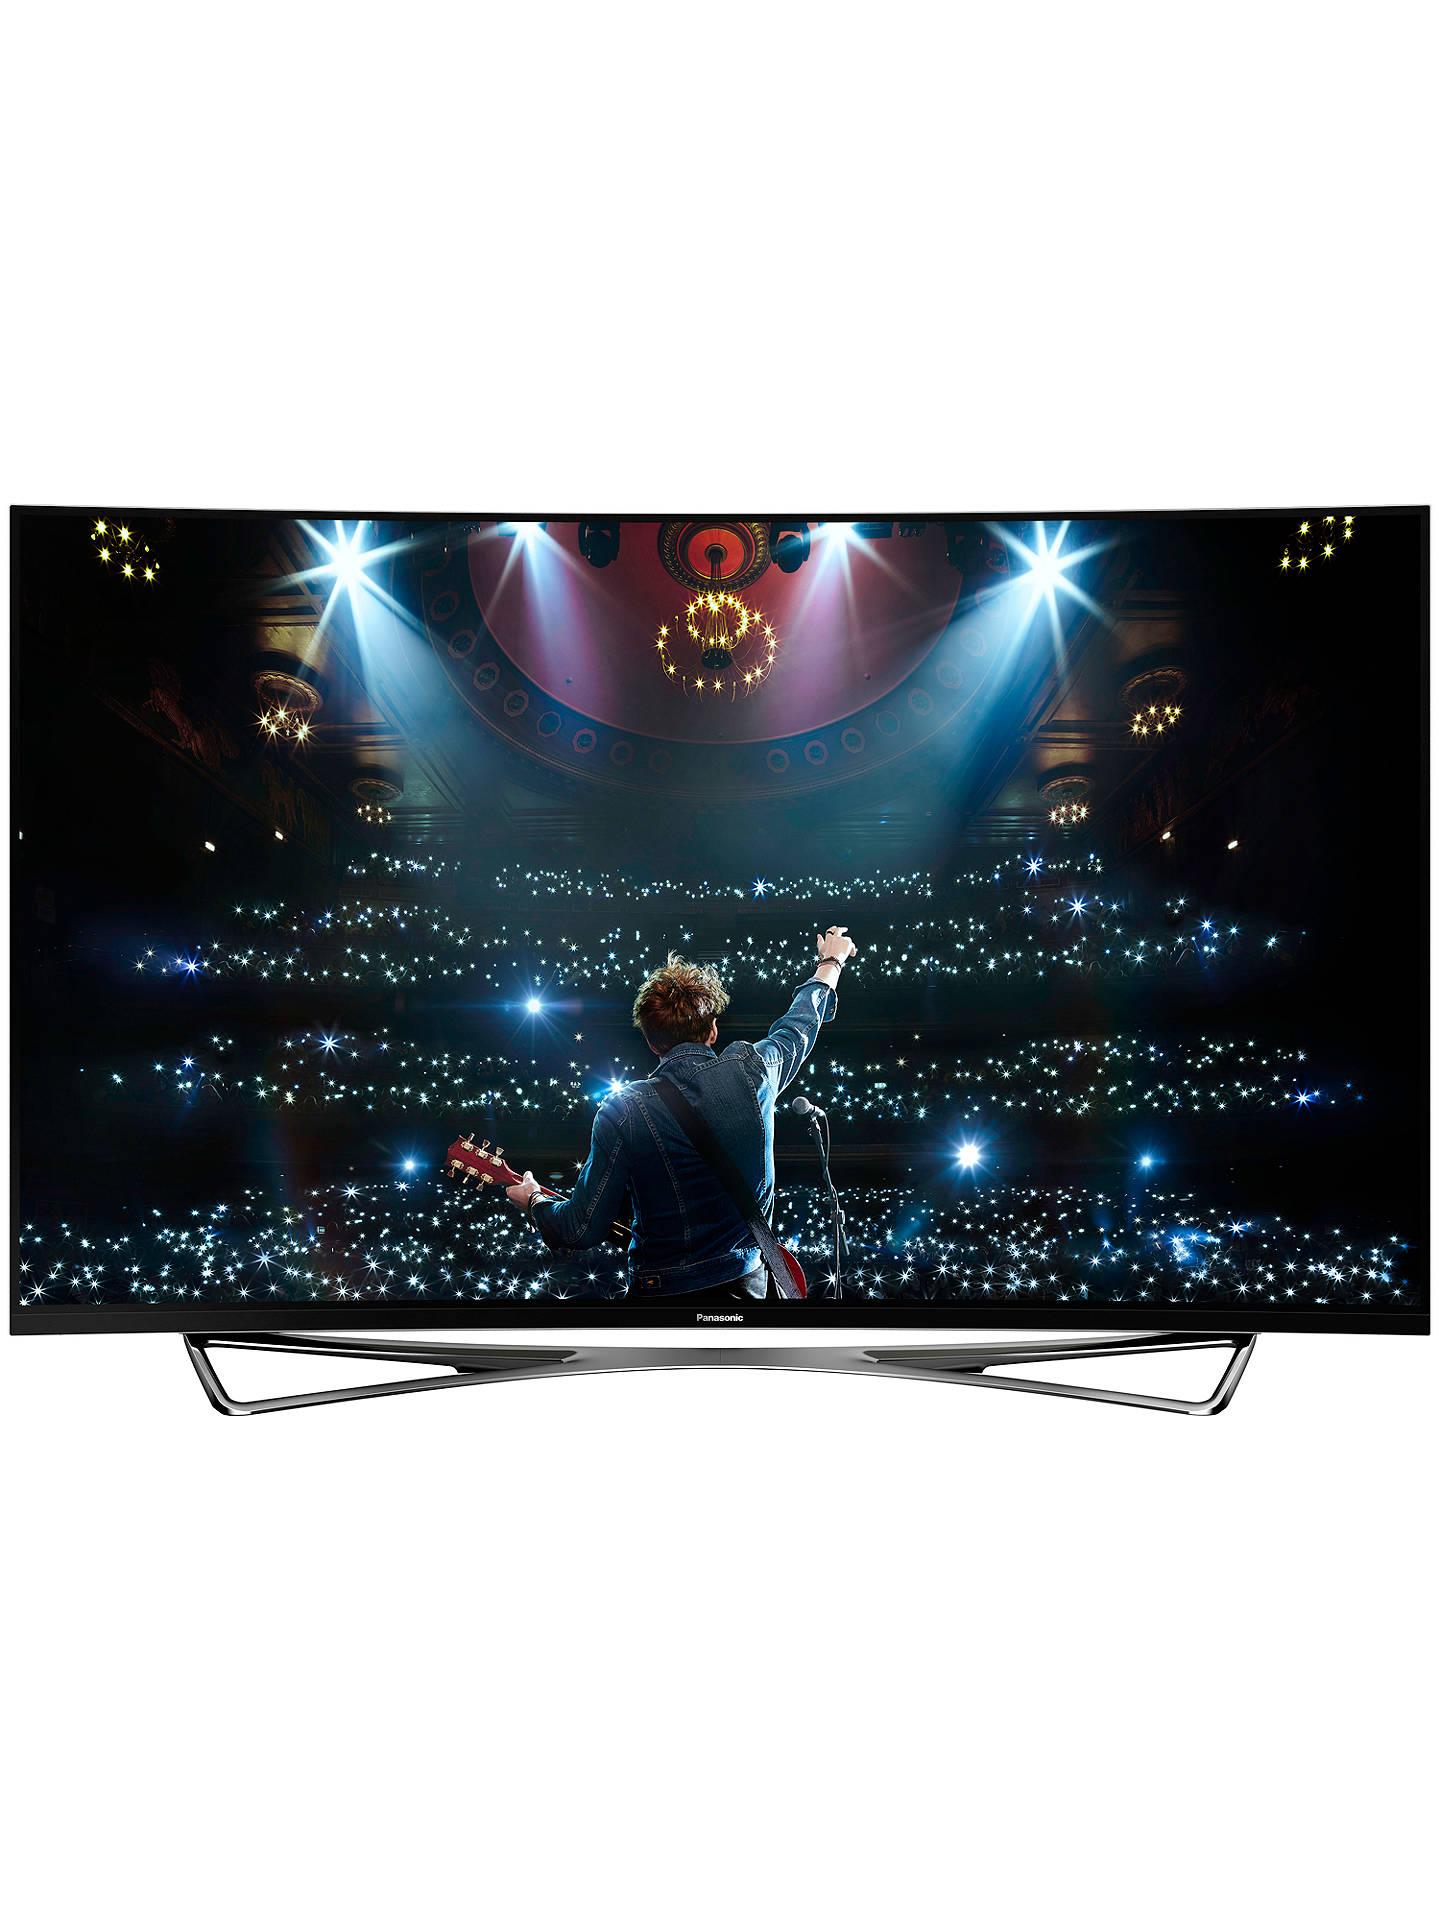 Panasonic Viera TX-65CZ952B OLED Curved 4K Ultra HD Smart TV, 65